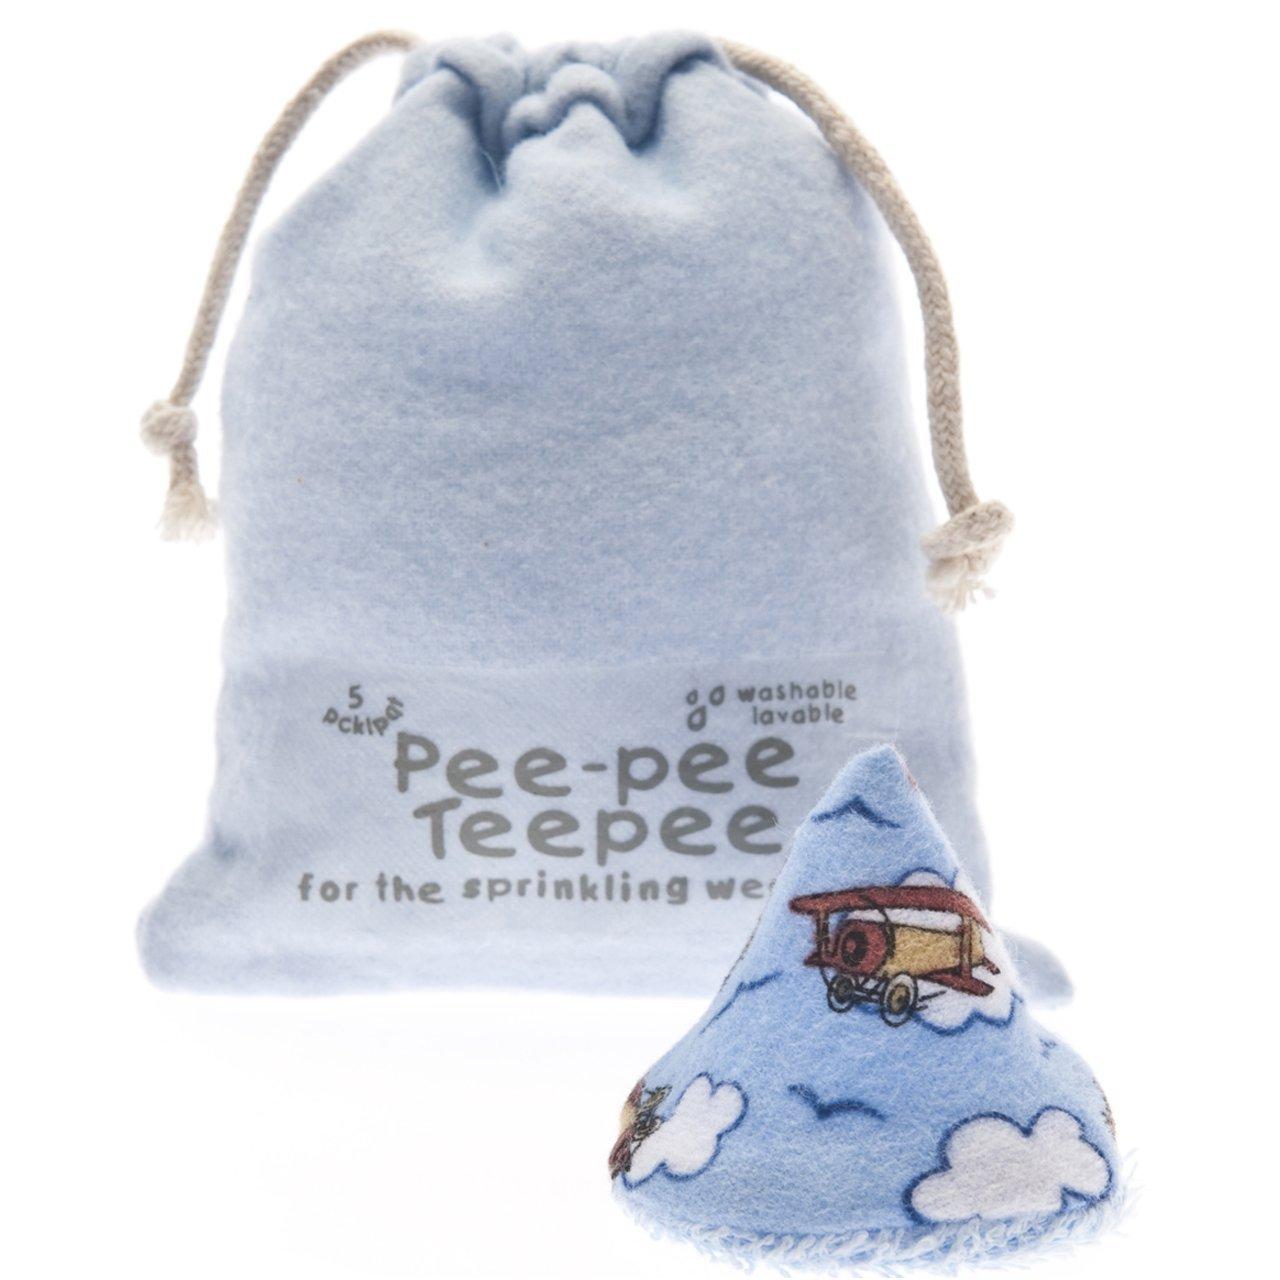 Pee-pee Teepee Airplane Blue - Laundry Bag Beba Bean PT3022-1